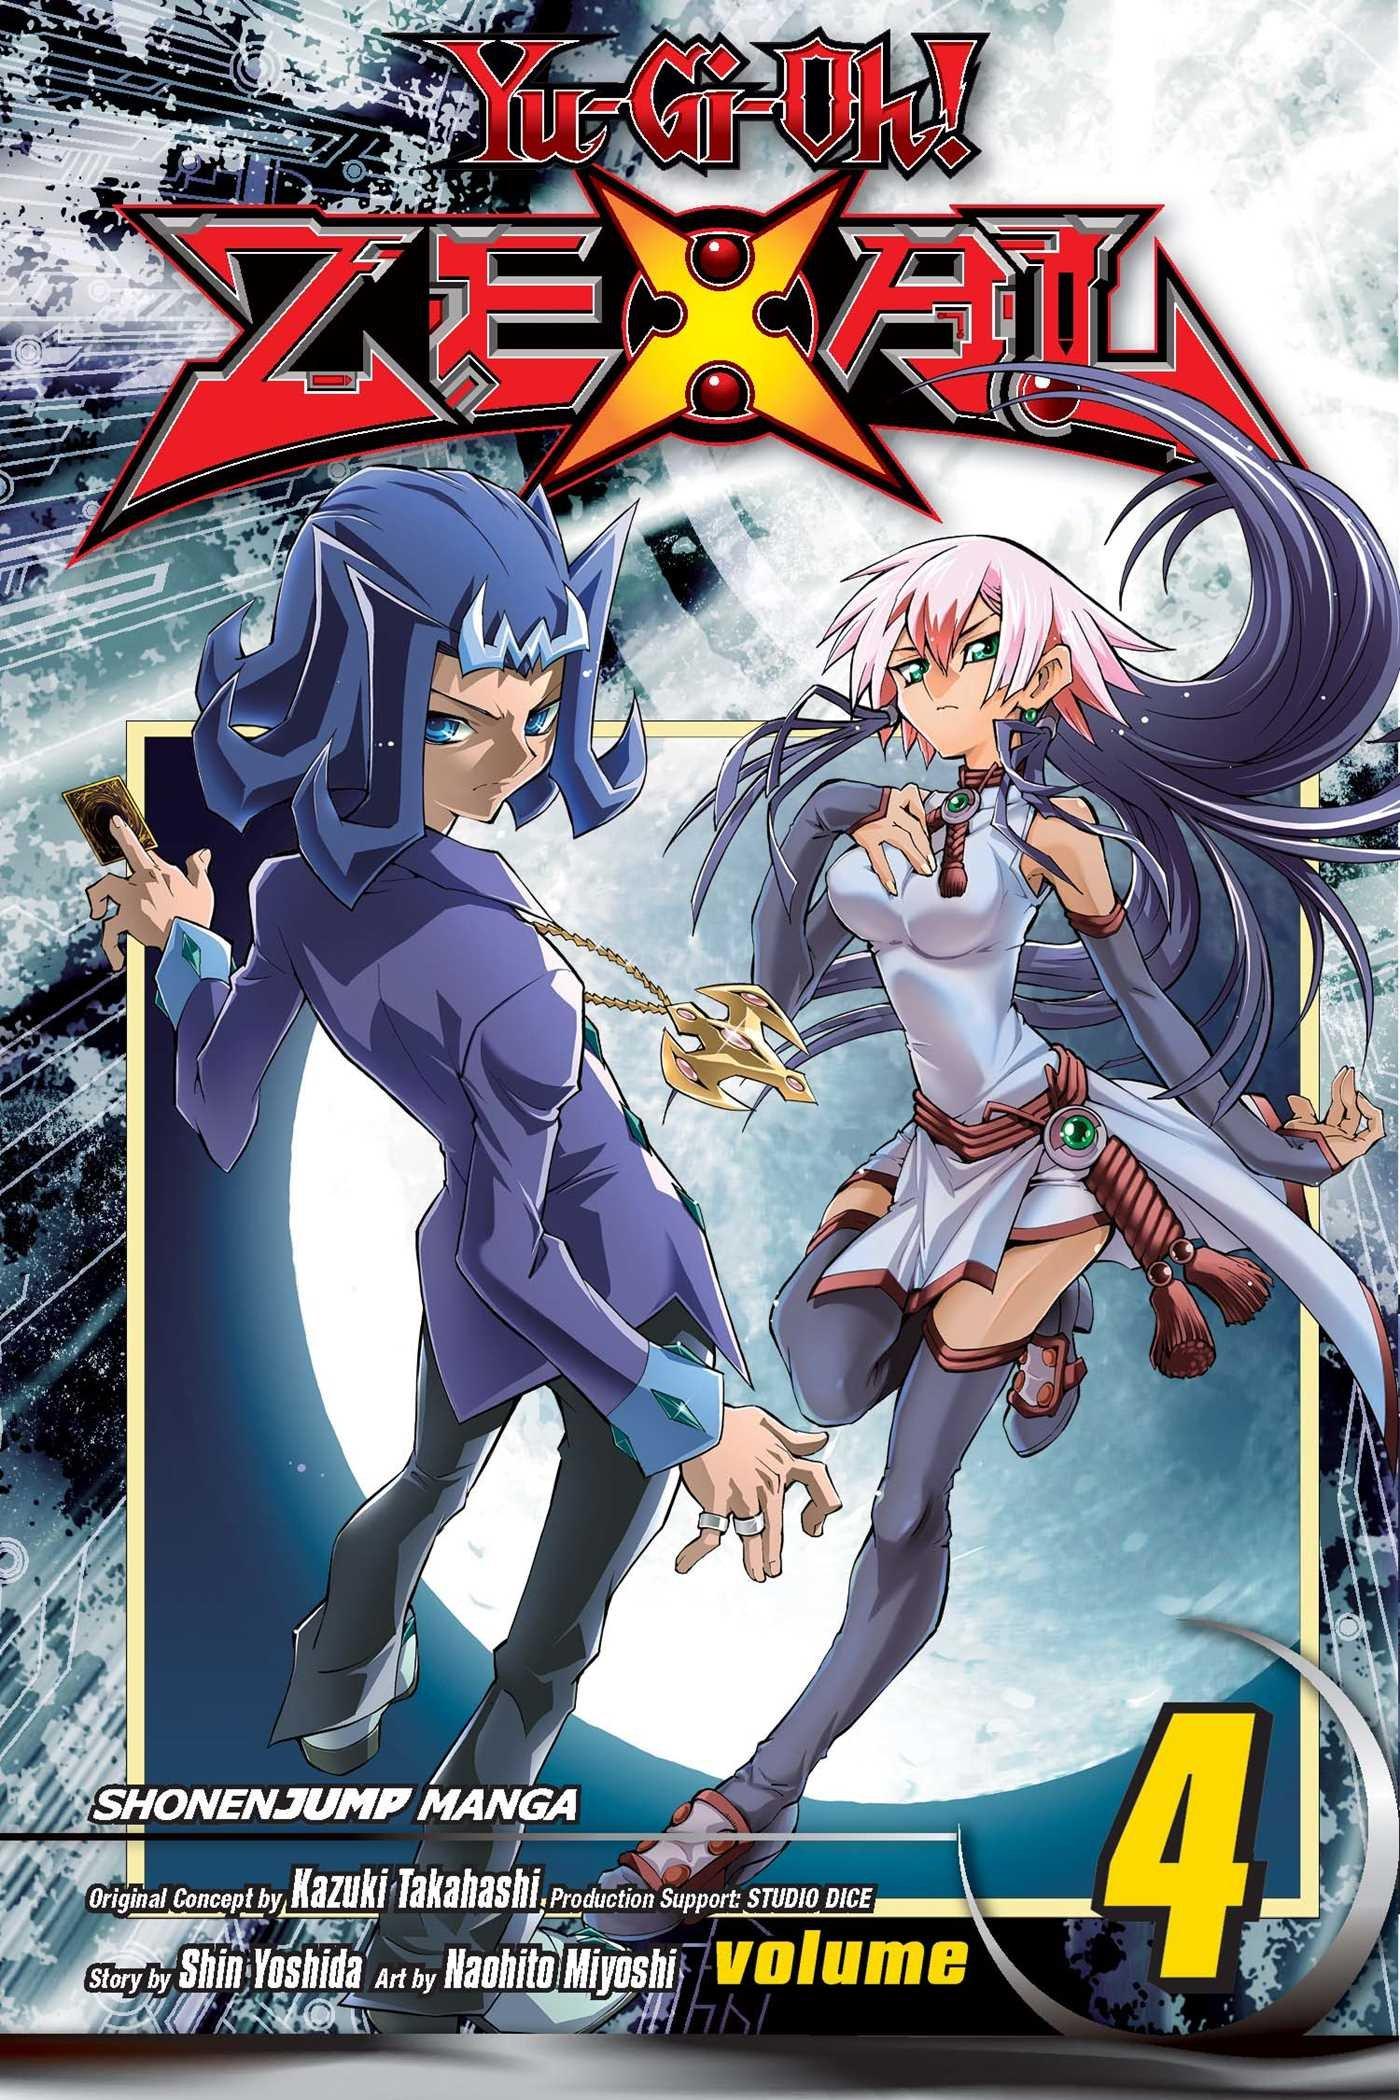 yu-gi-oh! zexal, anime, manga, cards, reviews, shark, ryoga kamishiro, reginald kastle